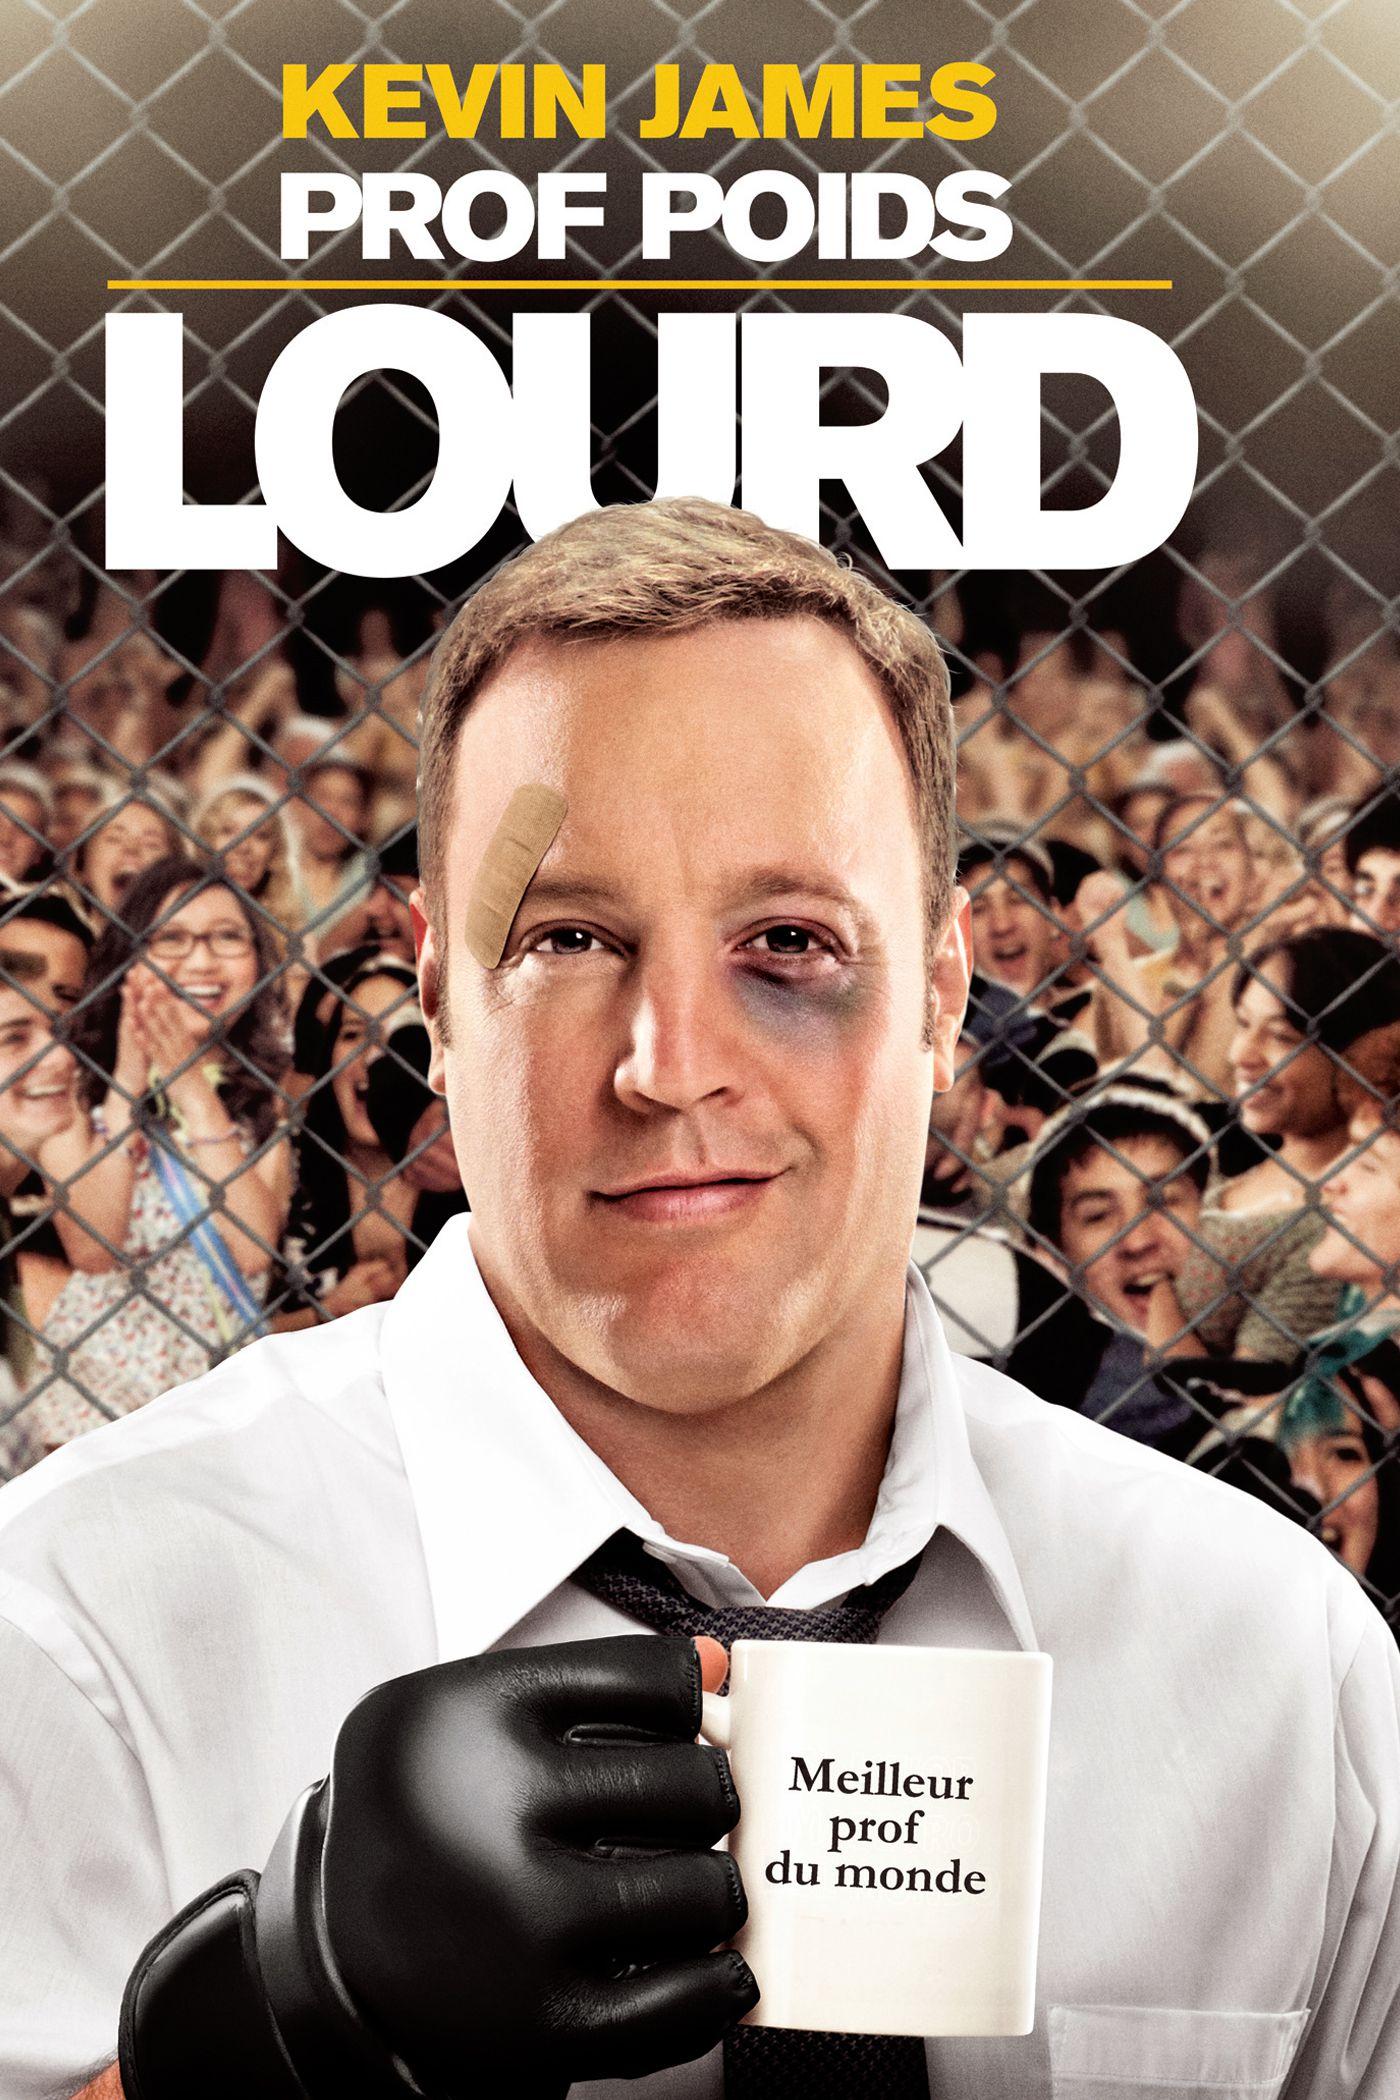 Prof poids lourd - Film (2013)